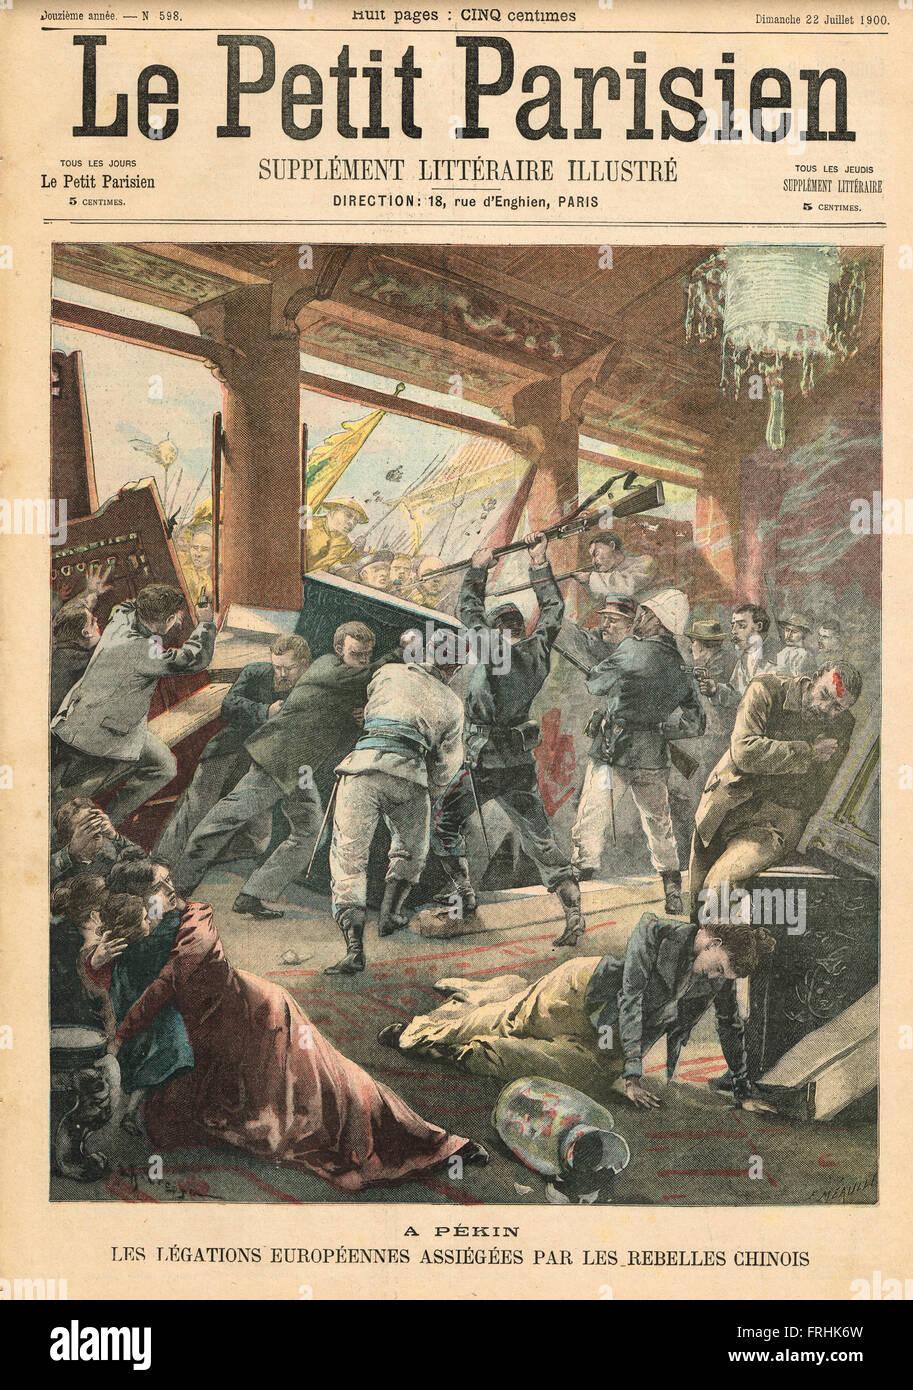 Siege of the legations Peking (Beijing) China 1900 - Stock Image